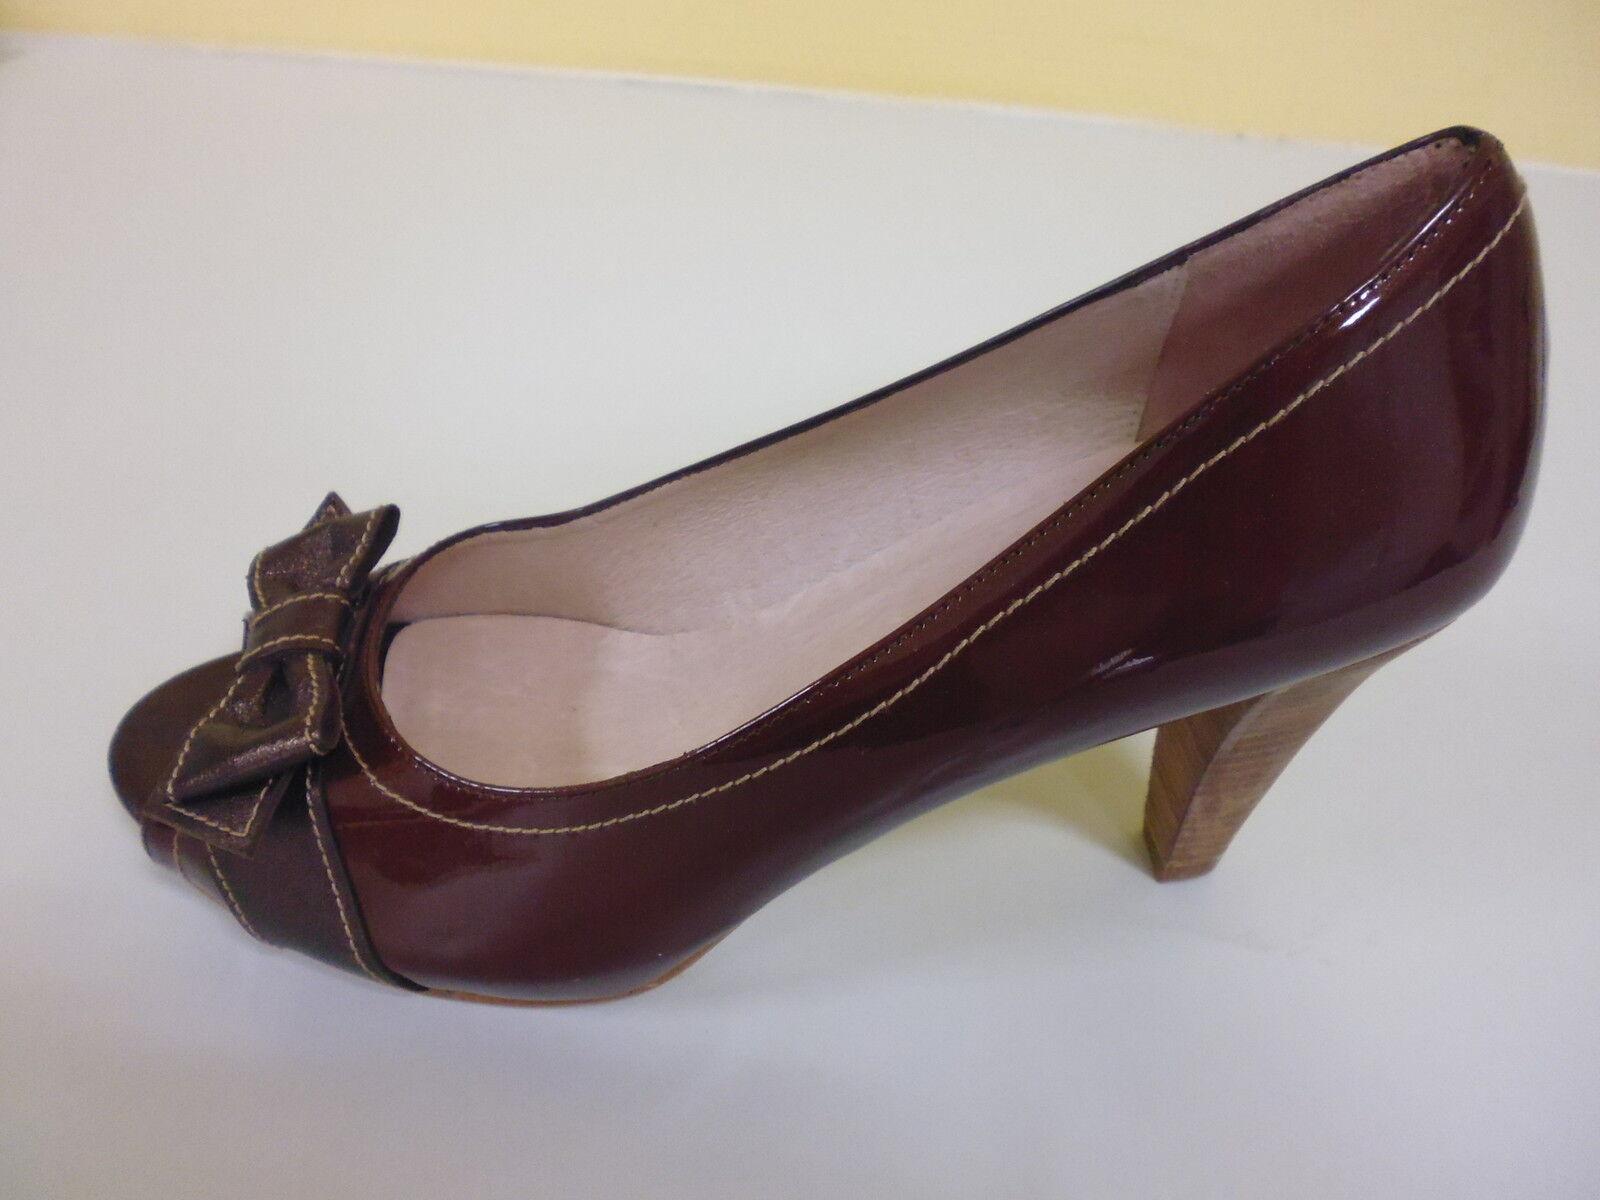 Chaussures chaussures femmes Sandales Peeptoes Cuir de studio W Taille 40 (6,5)